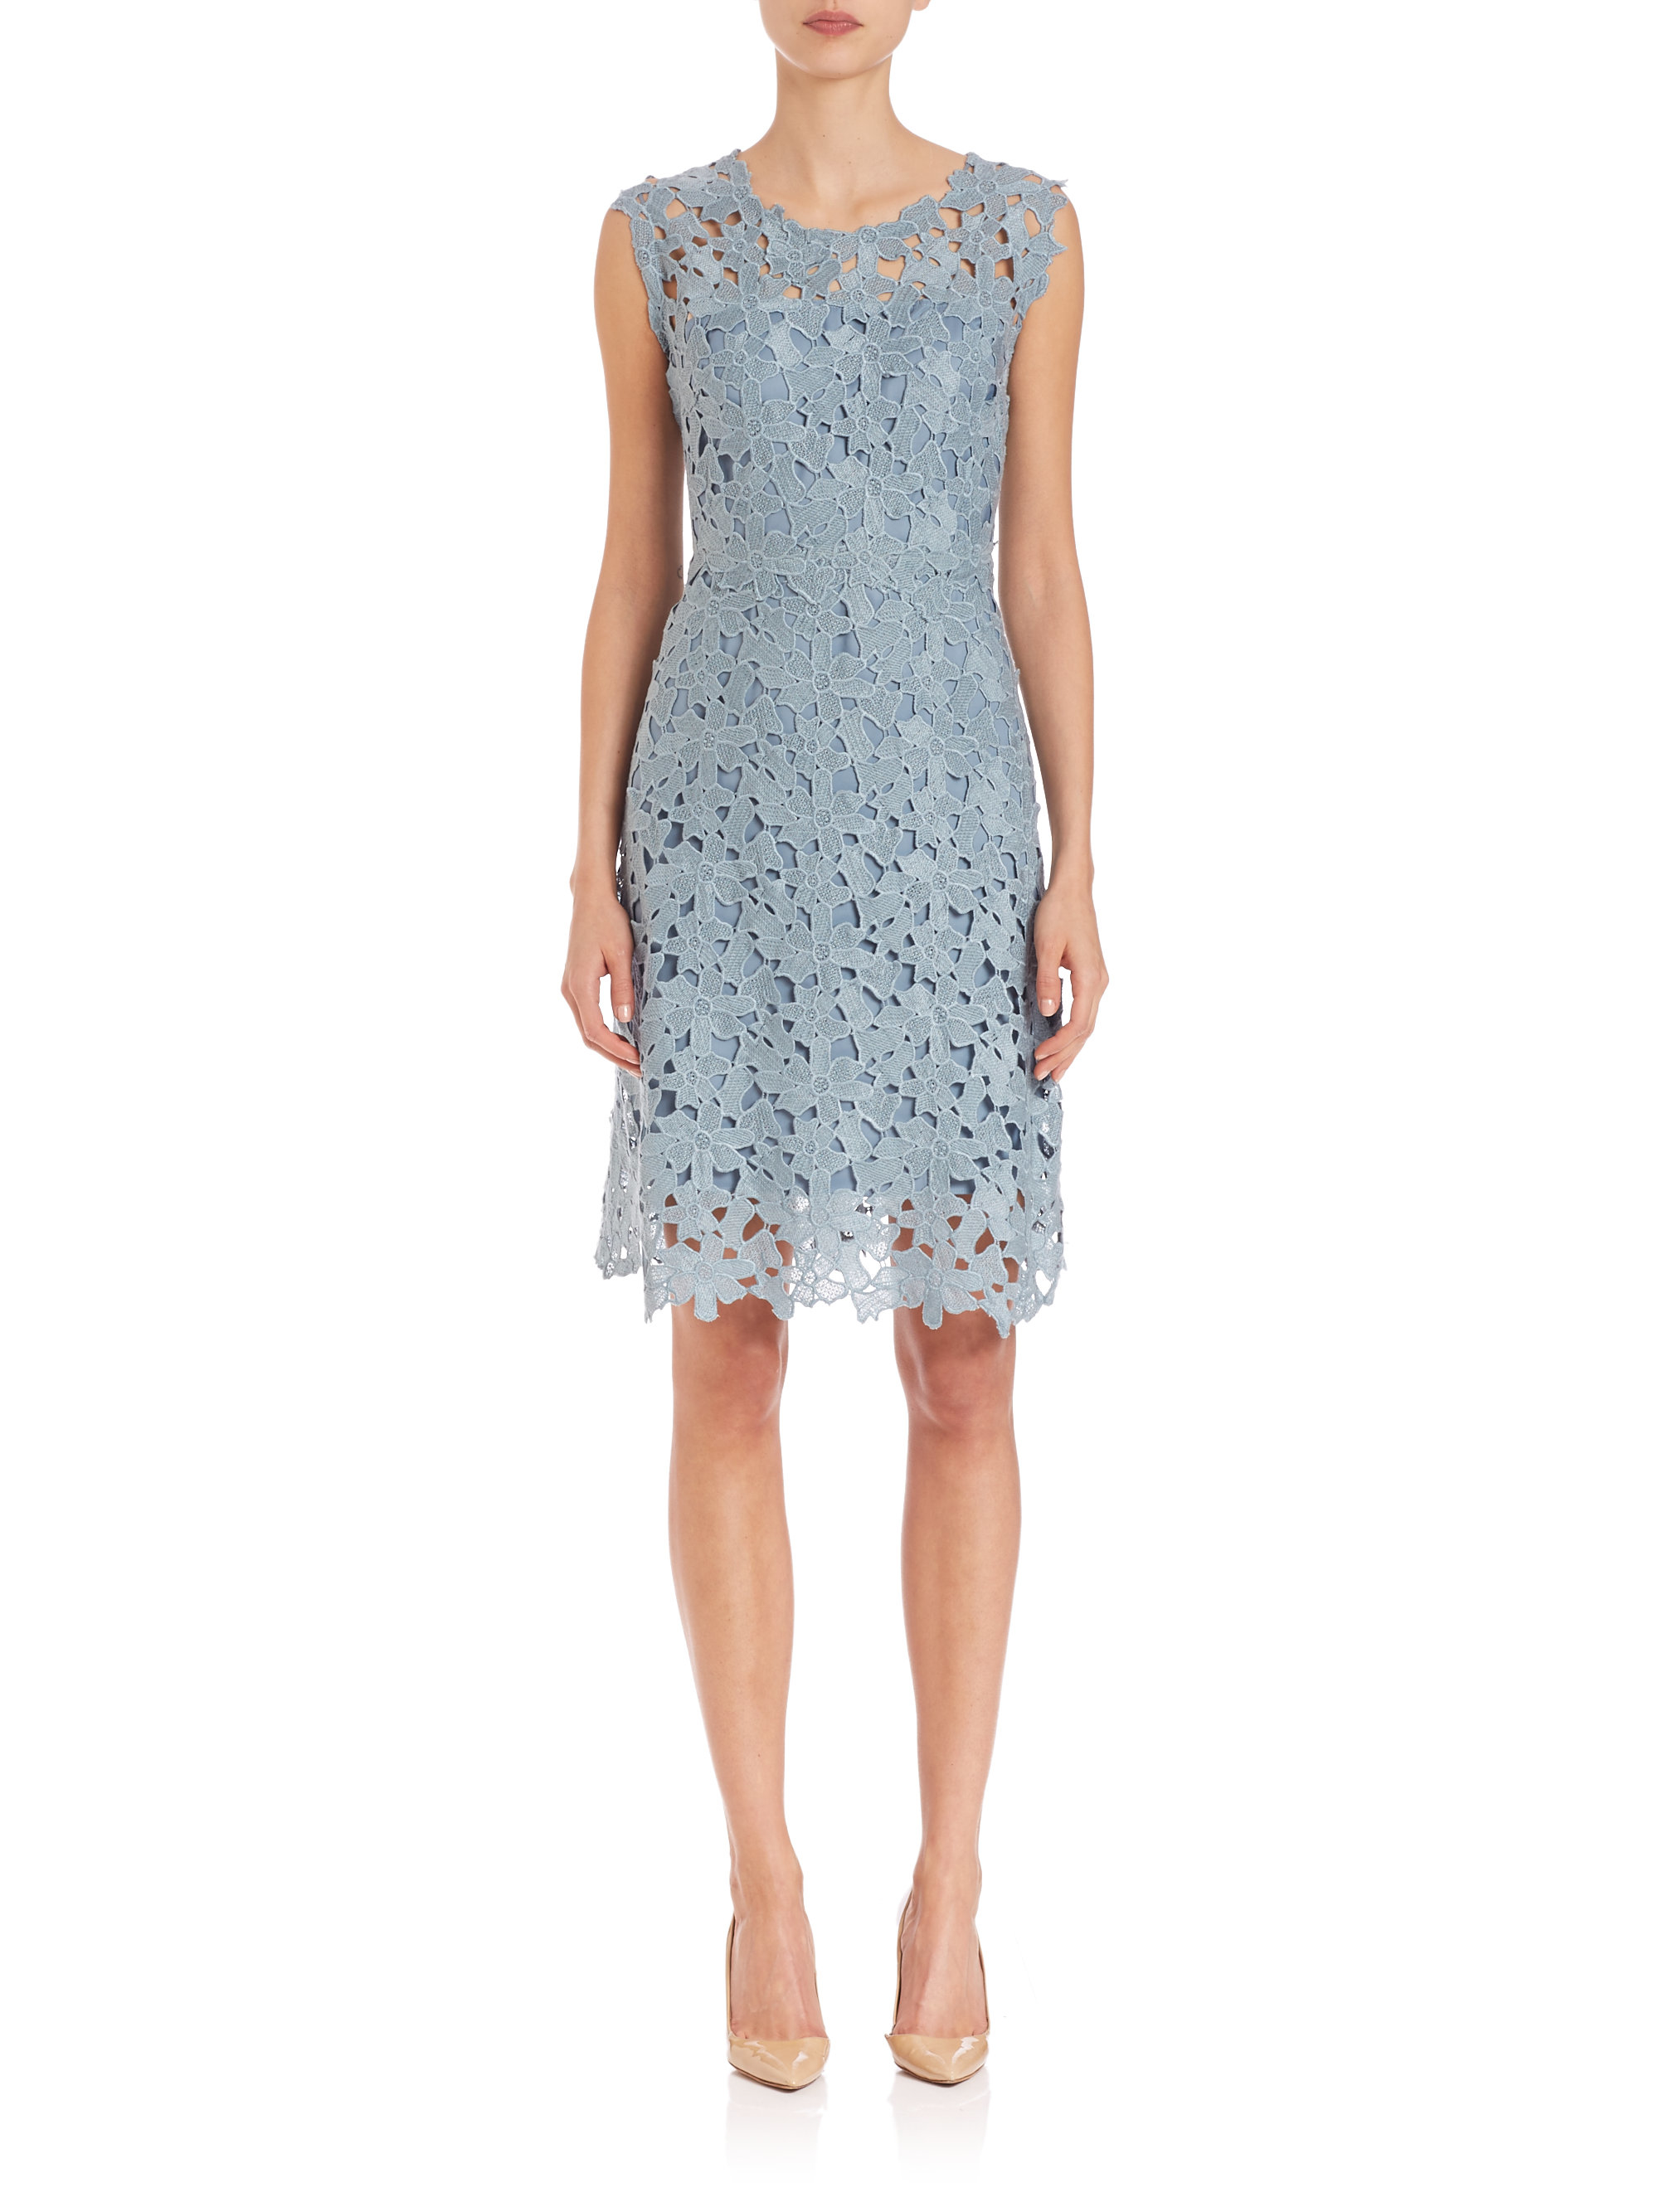 Elie tahari Ophelia Lace Dress in Blue (gust) | Lyst